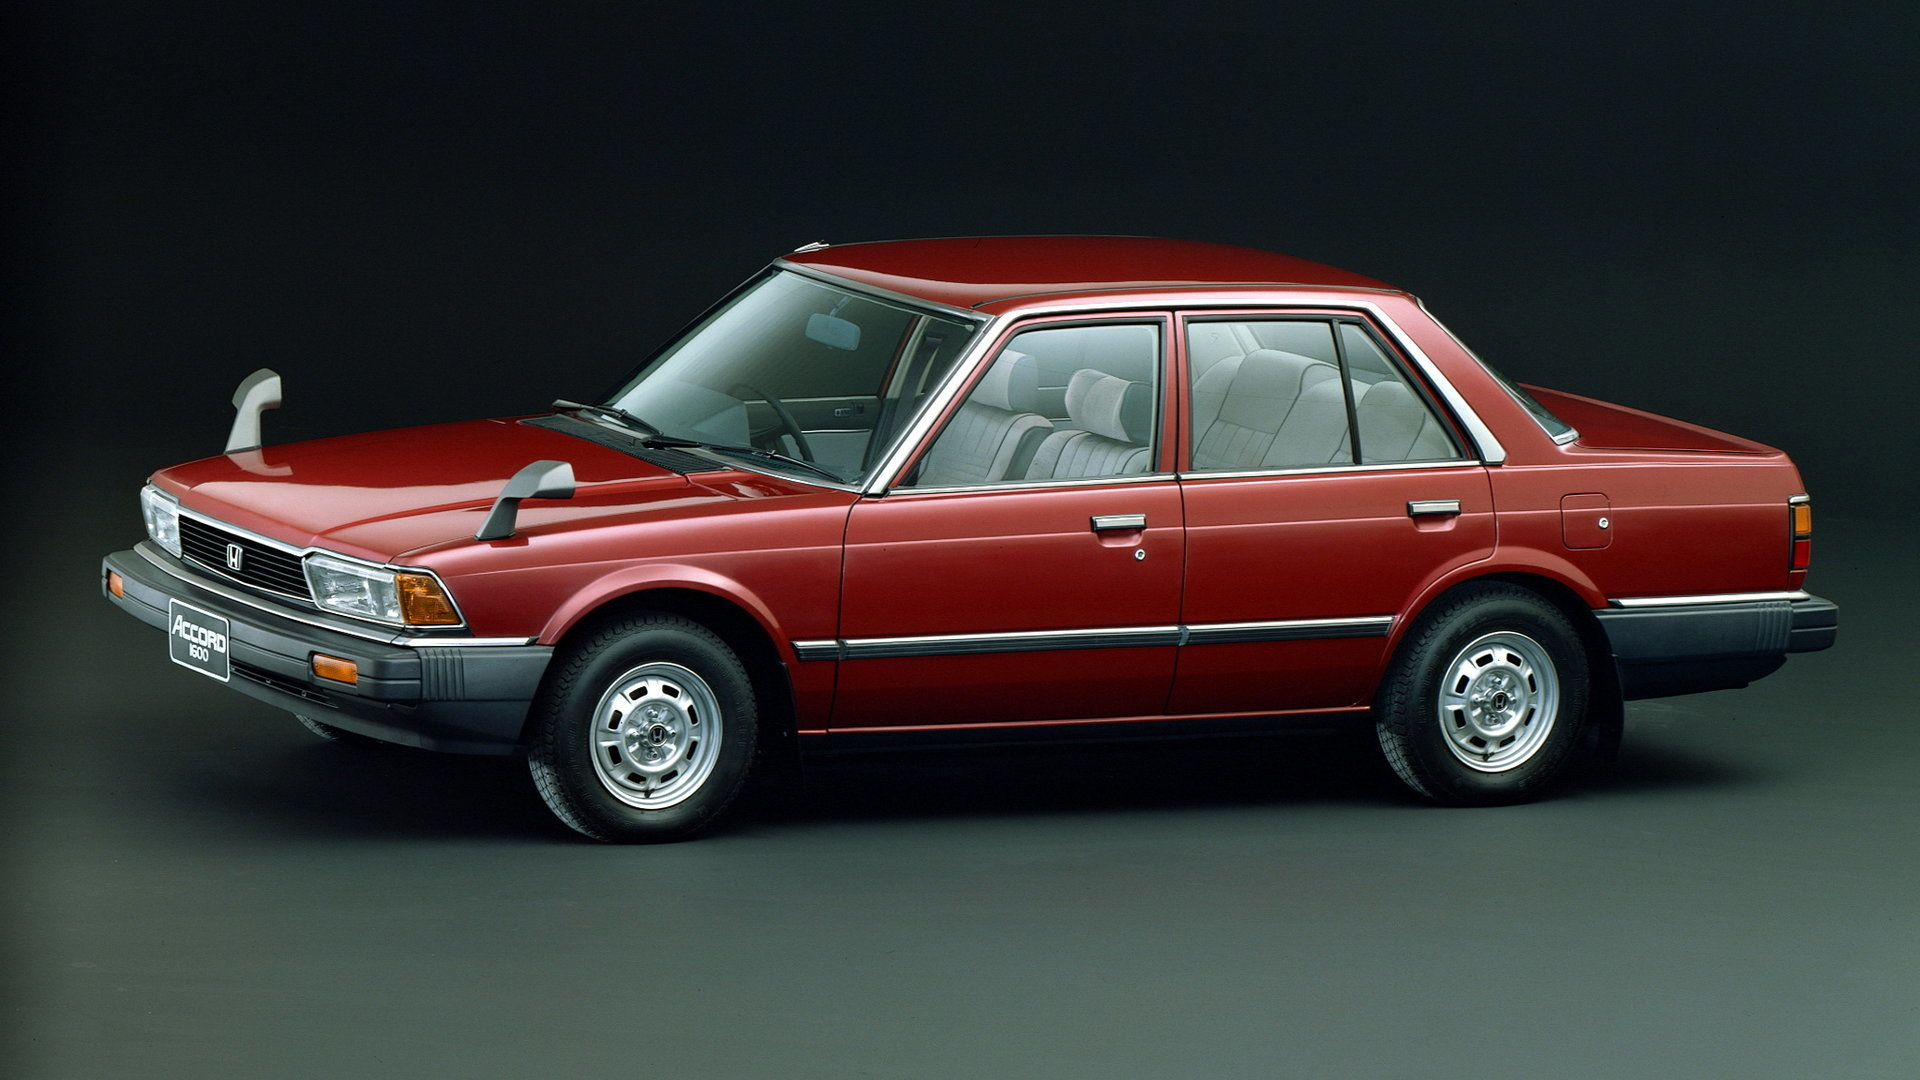 Coche del día: Honda Accord 1.6 EX Hondamatic (SY/SZ)